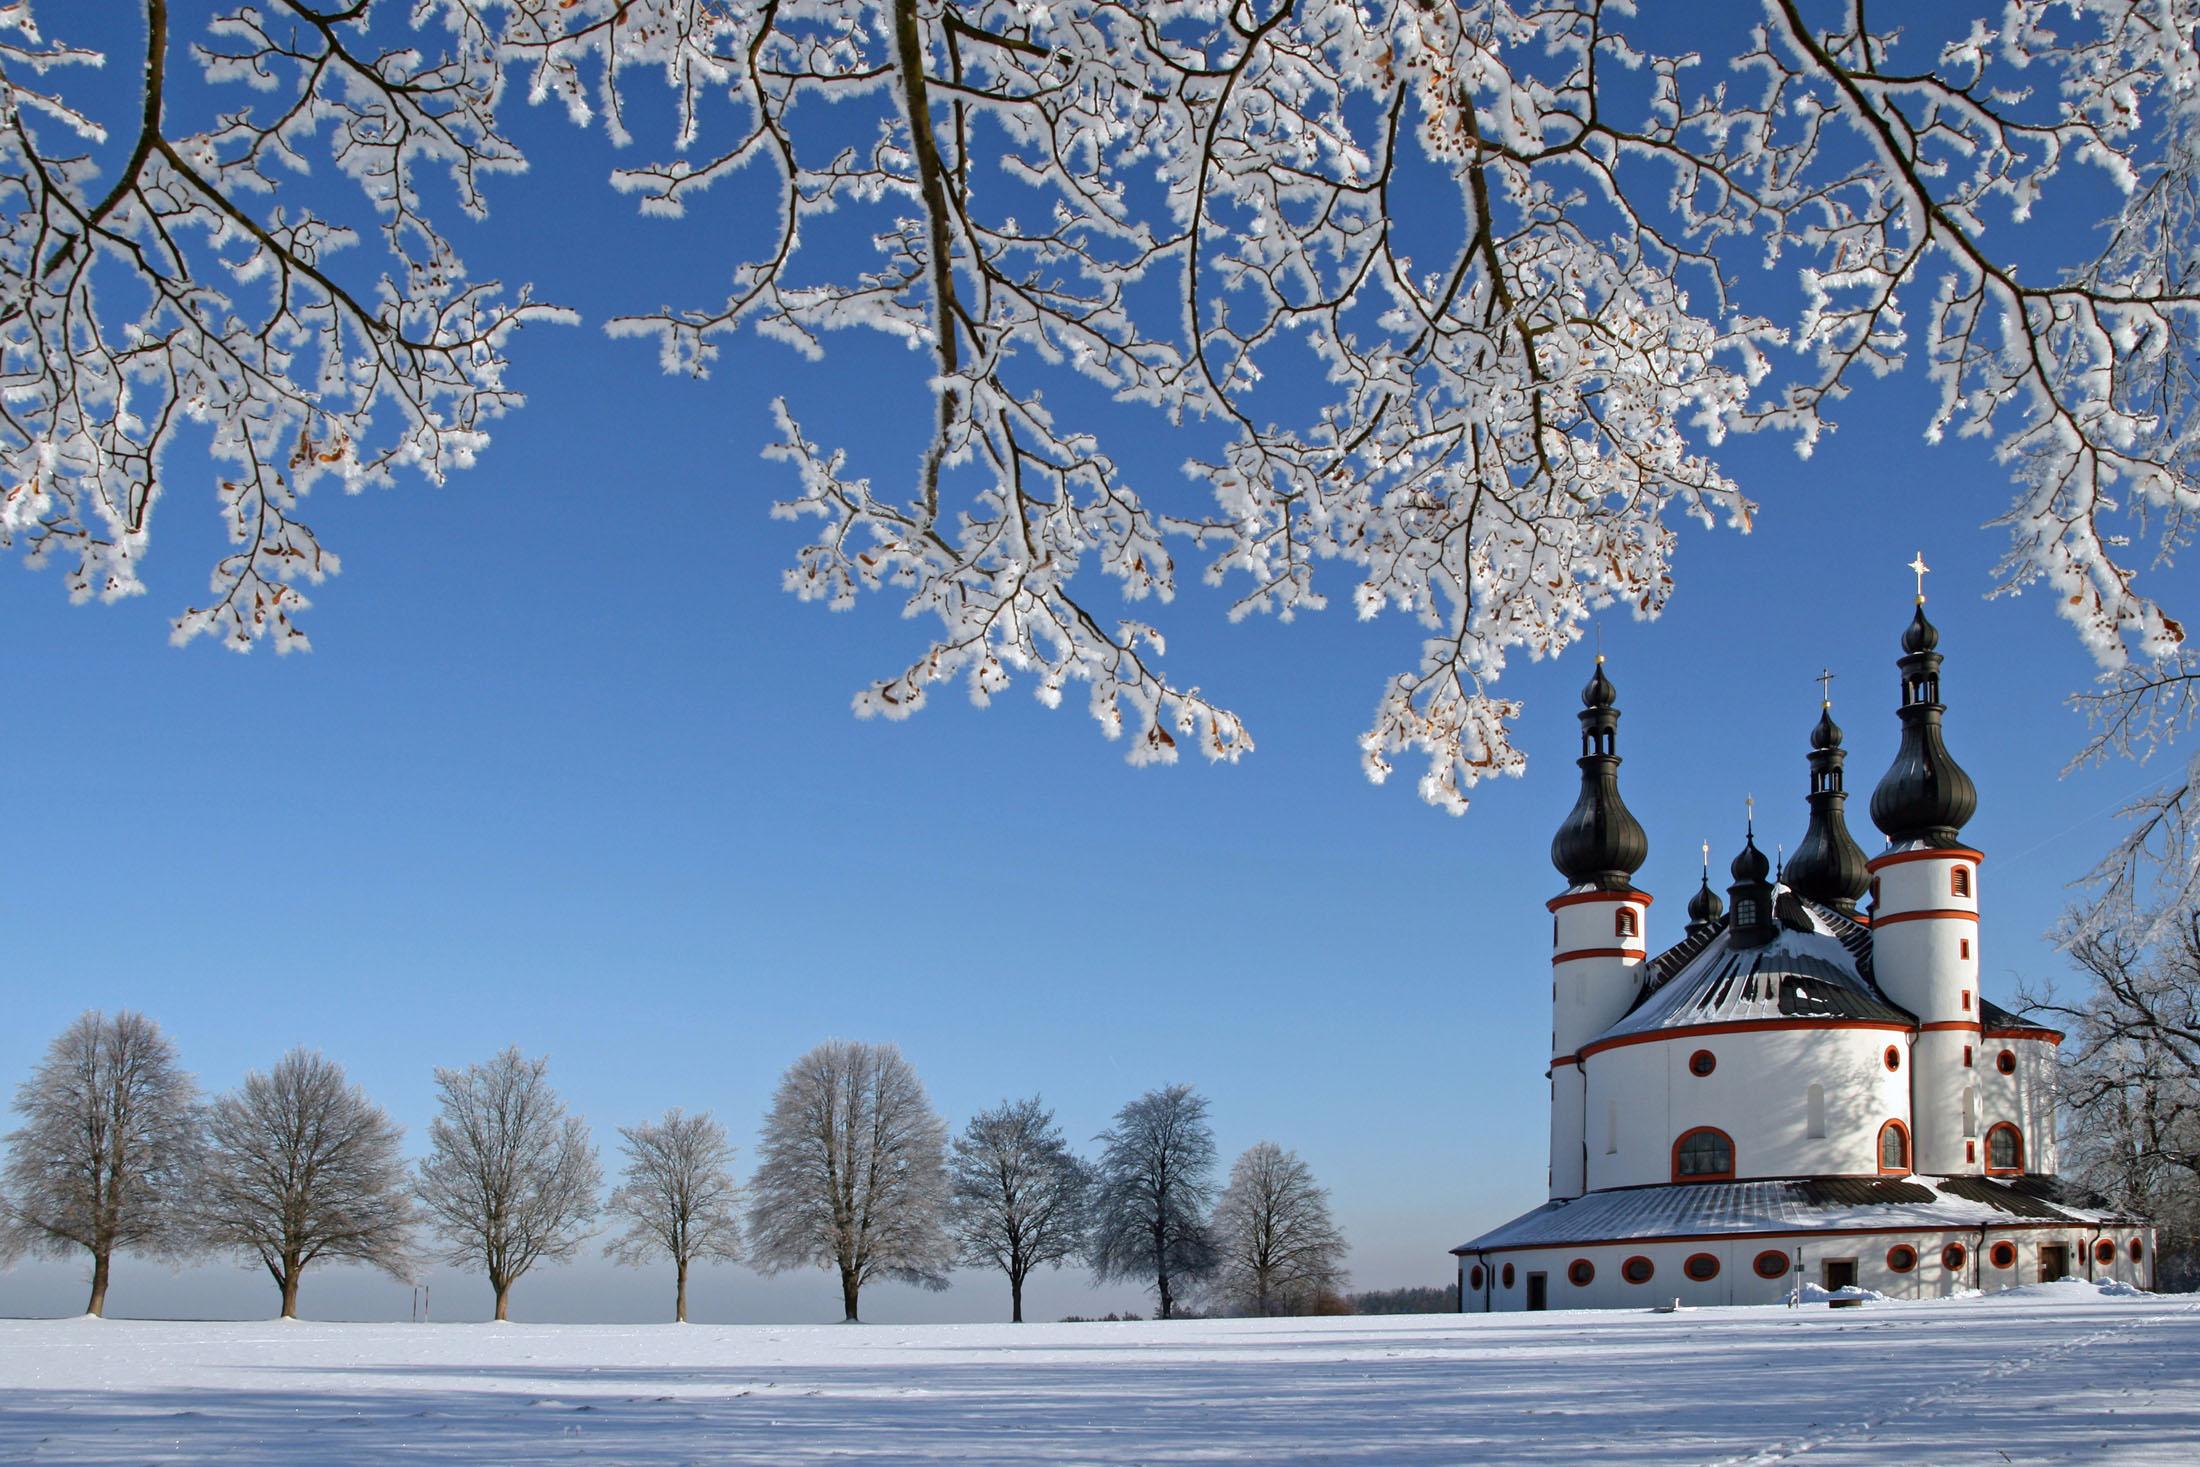 The Kappl Sanctuary of the Holy Trinity (Waldsassen).